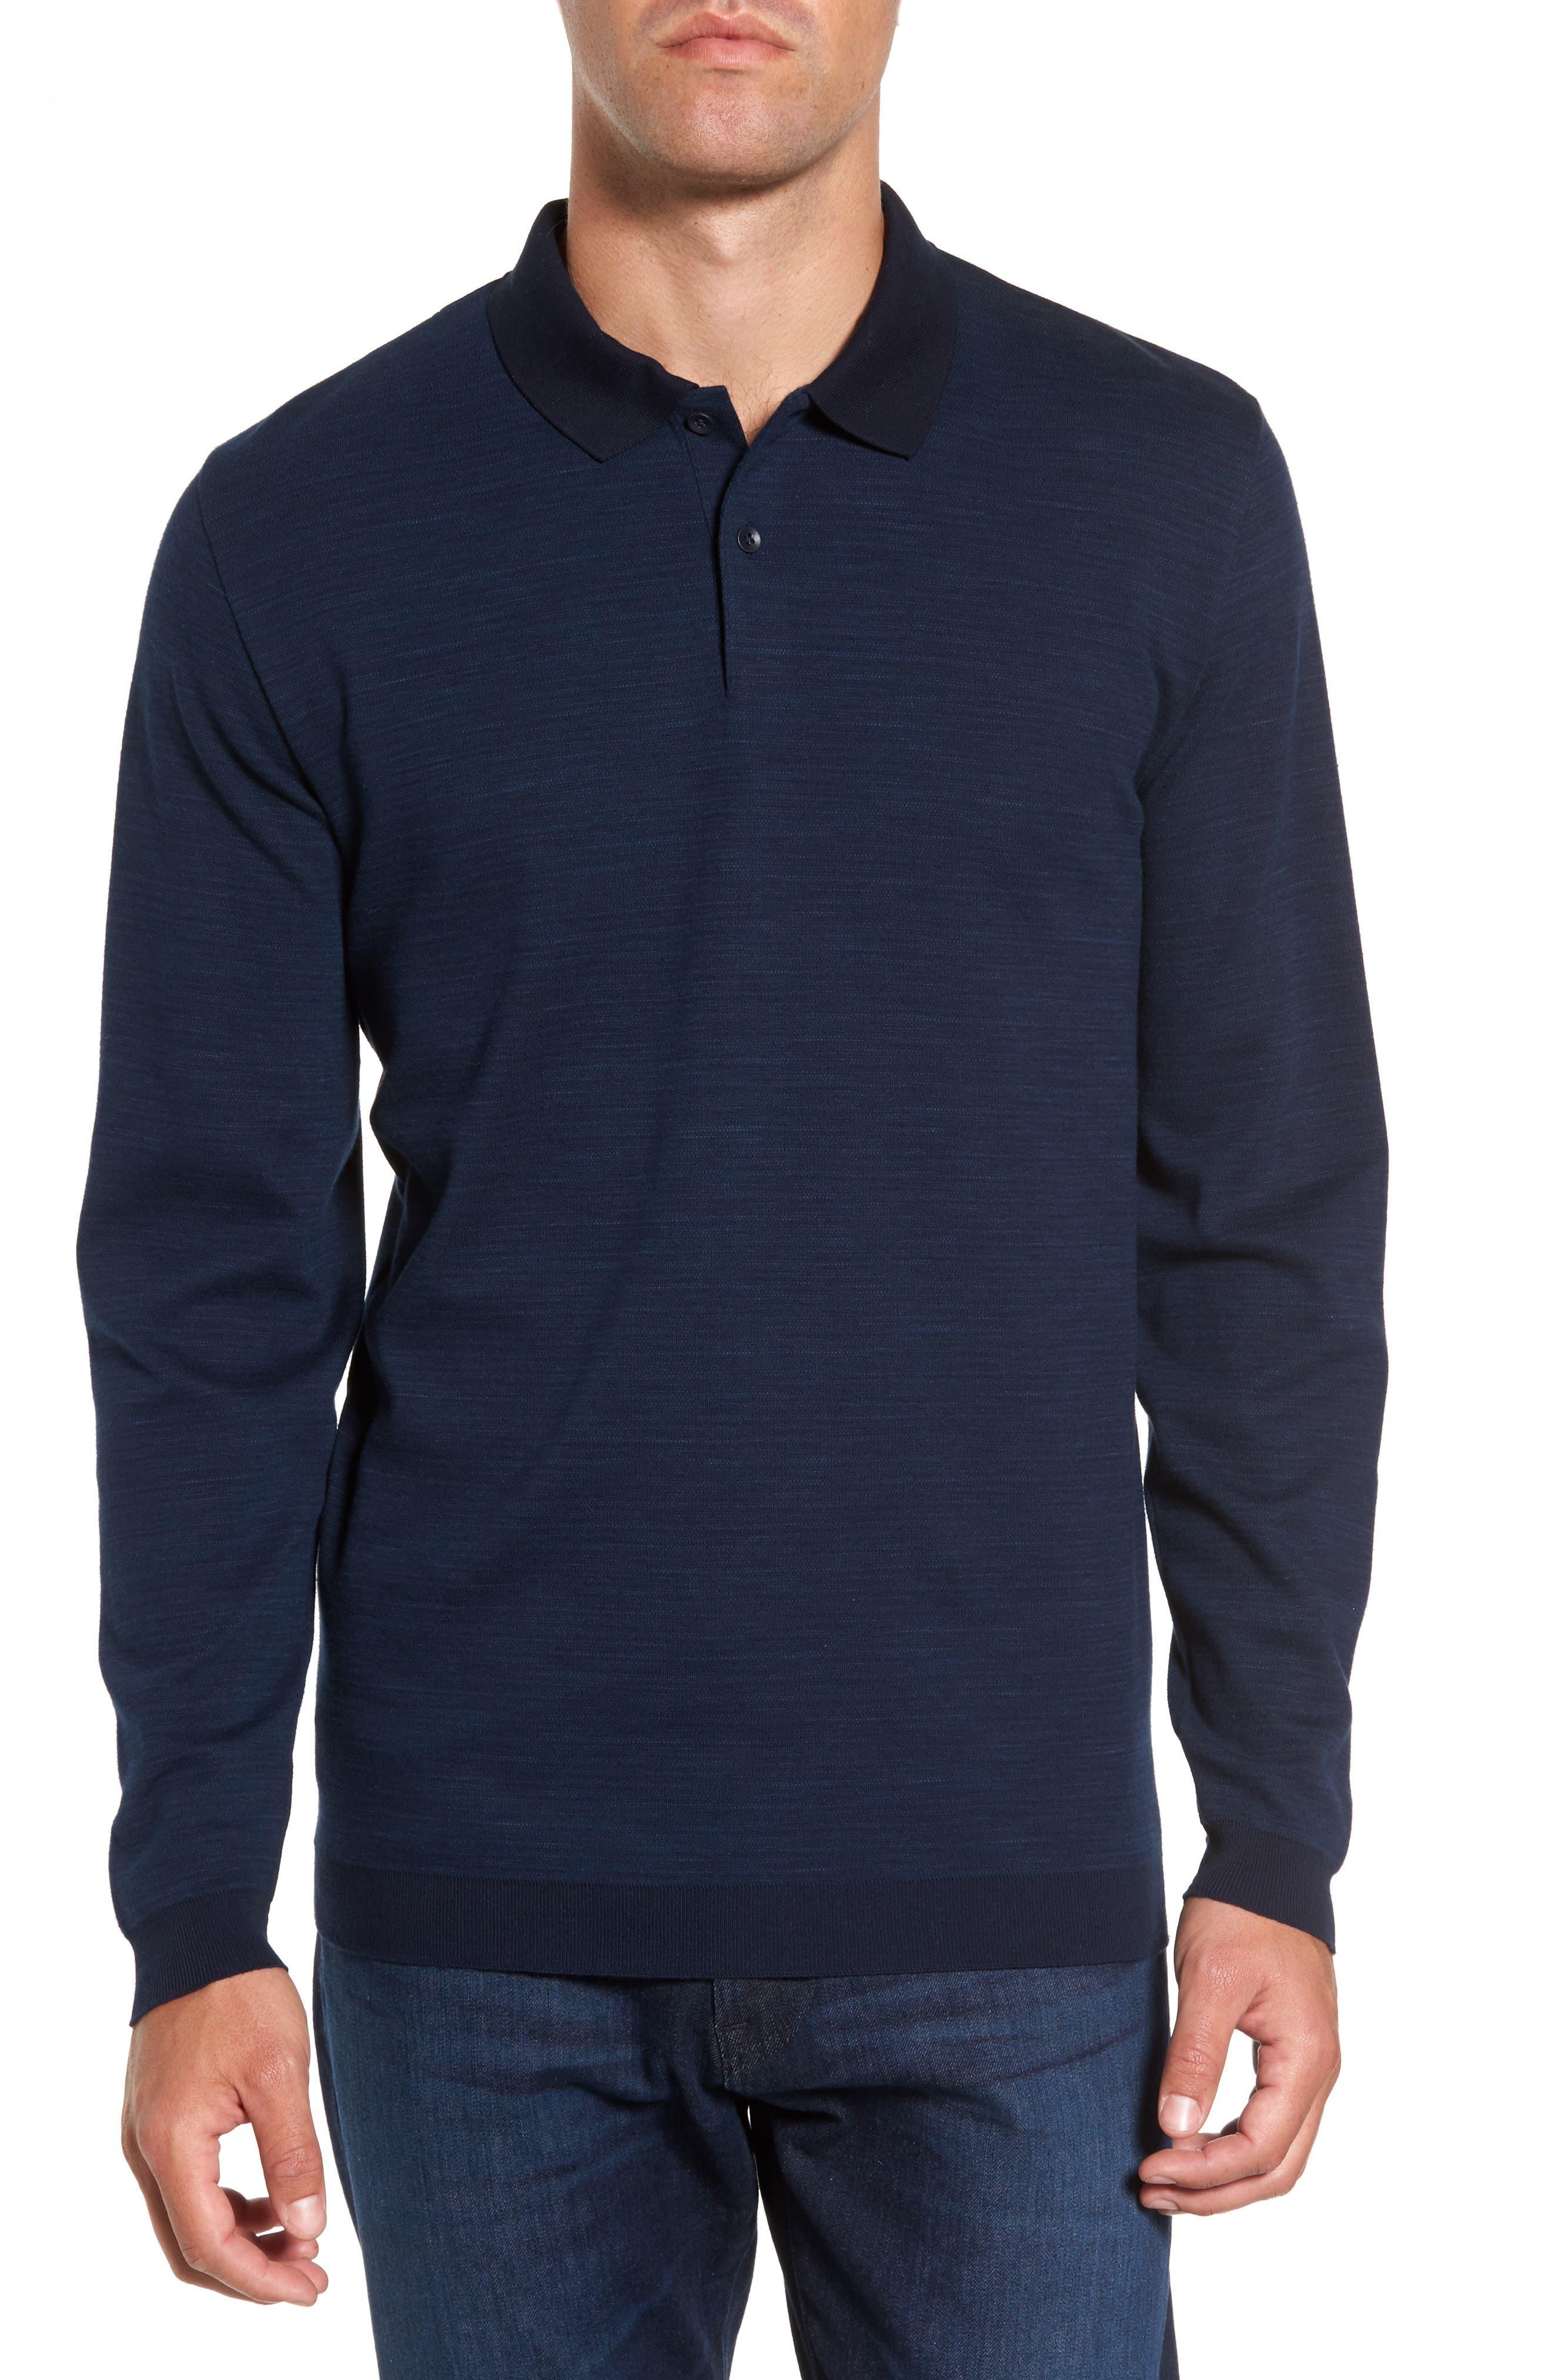 Shelton Cotton Sweater,                             Main thumbnail 1, color,                             Ocean